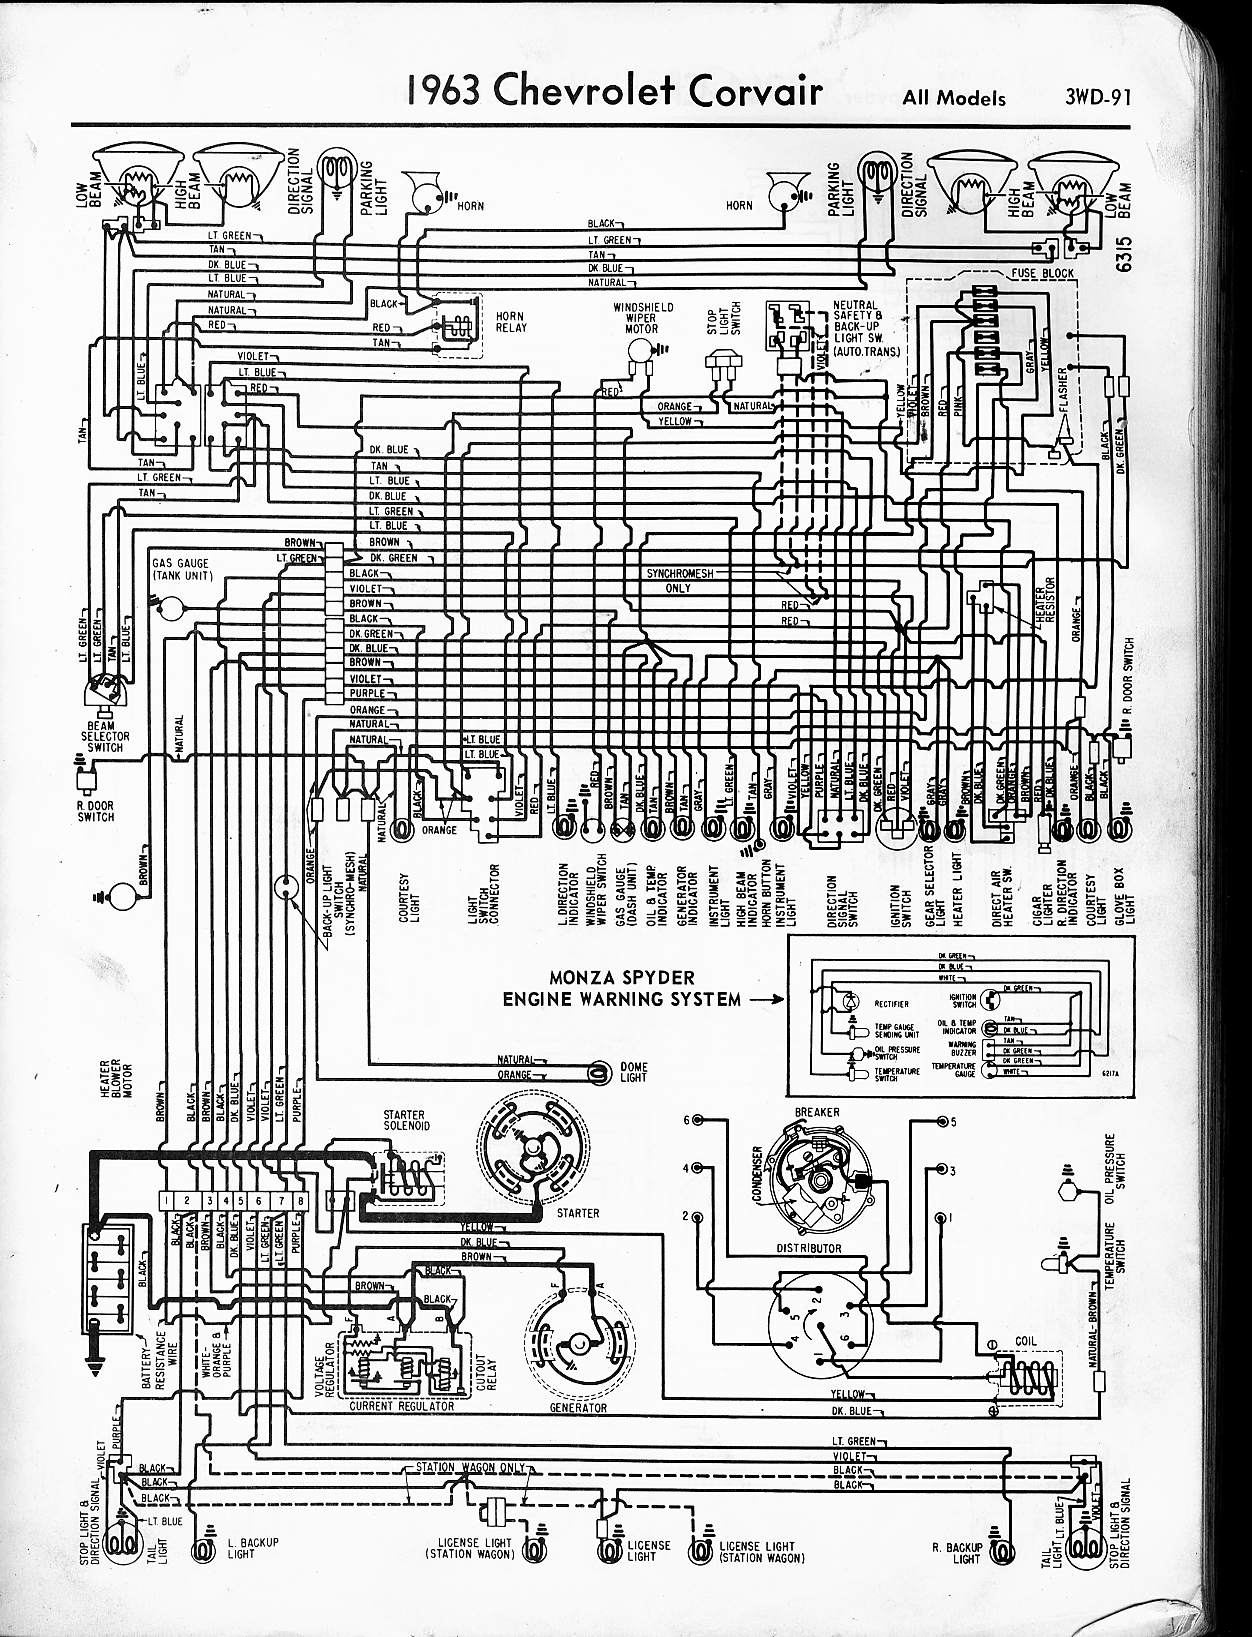 Outstanding 1976 Caprice Wiring Diagram Wiring Diagram Data Schema Wiring Cloud Cranvenetmohammedshrineorg